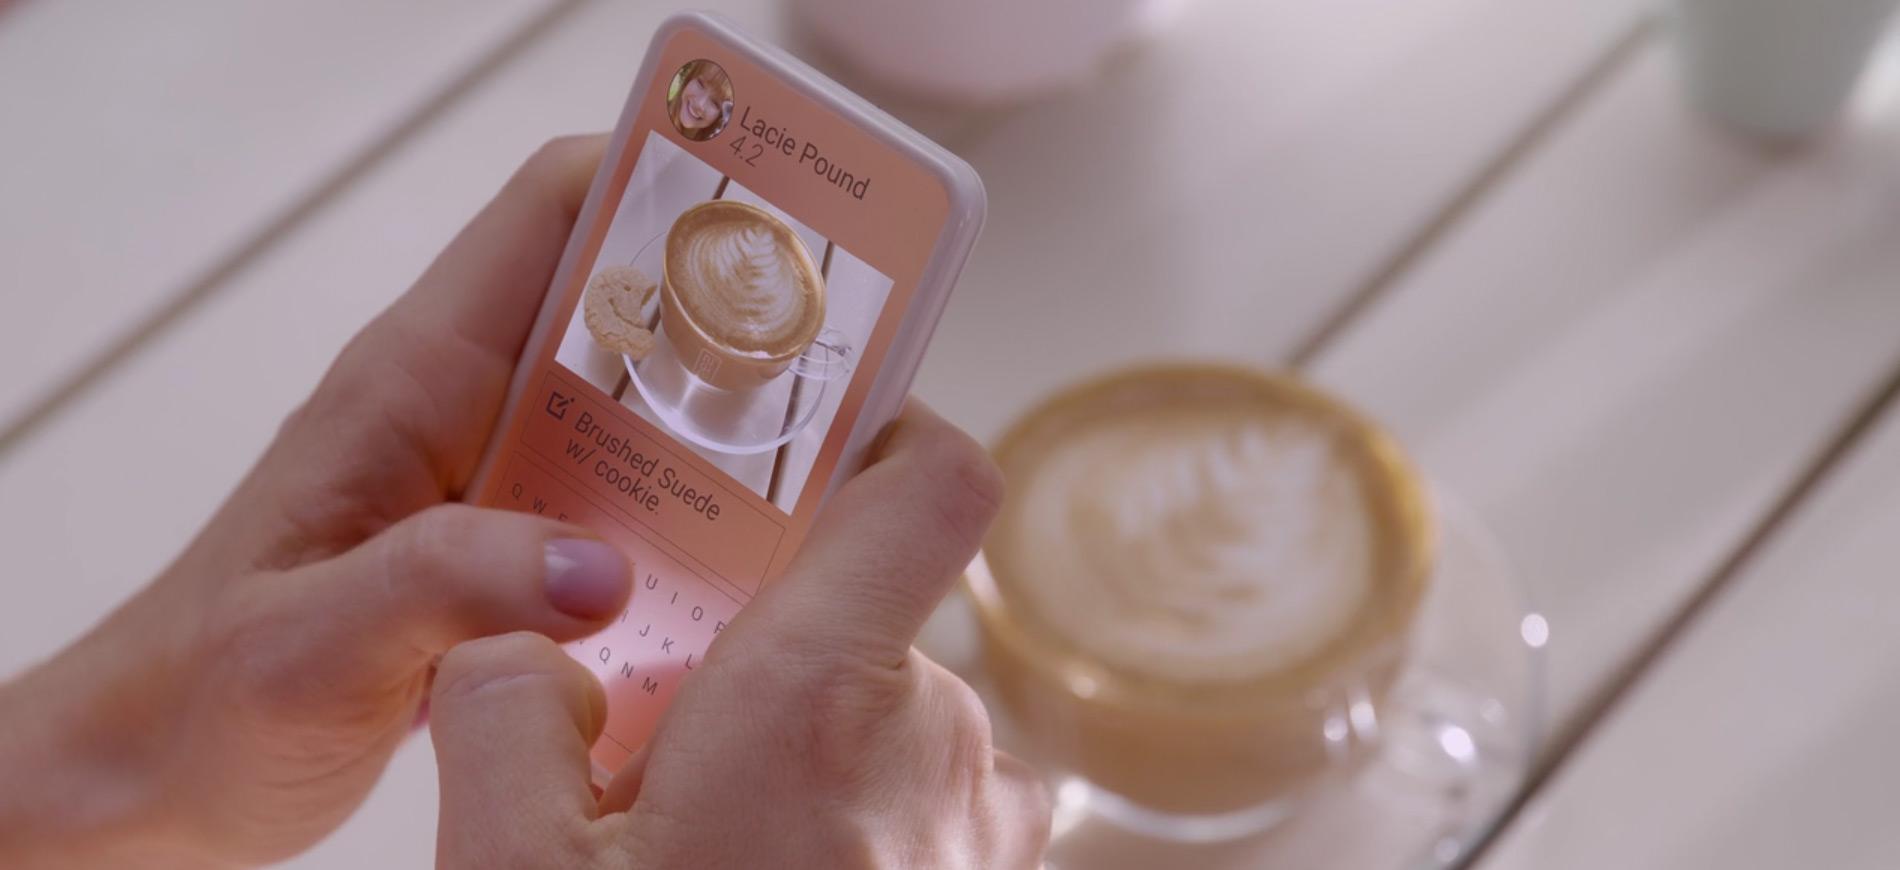 The Social Credit App seen in Black Mirror is becoming